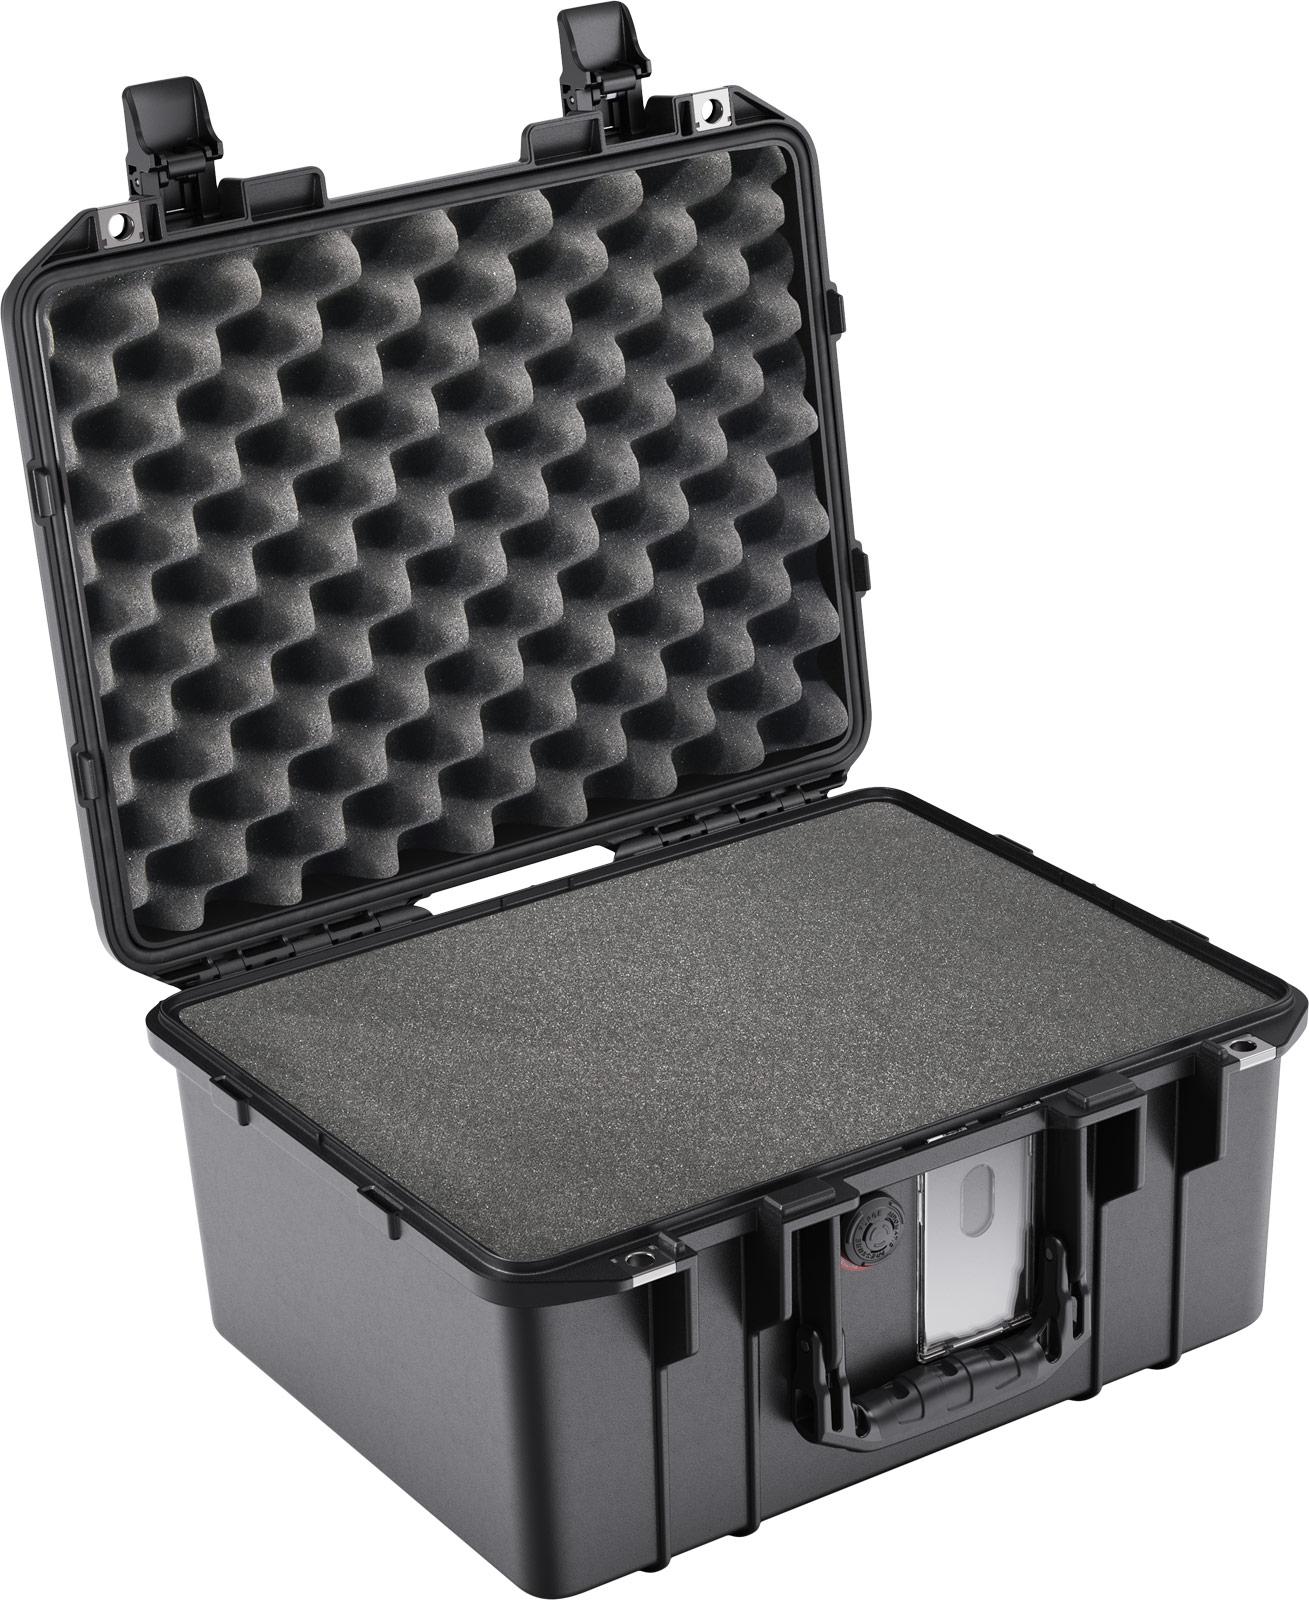 pelican air 1507 watertight case